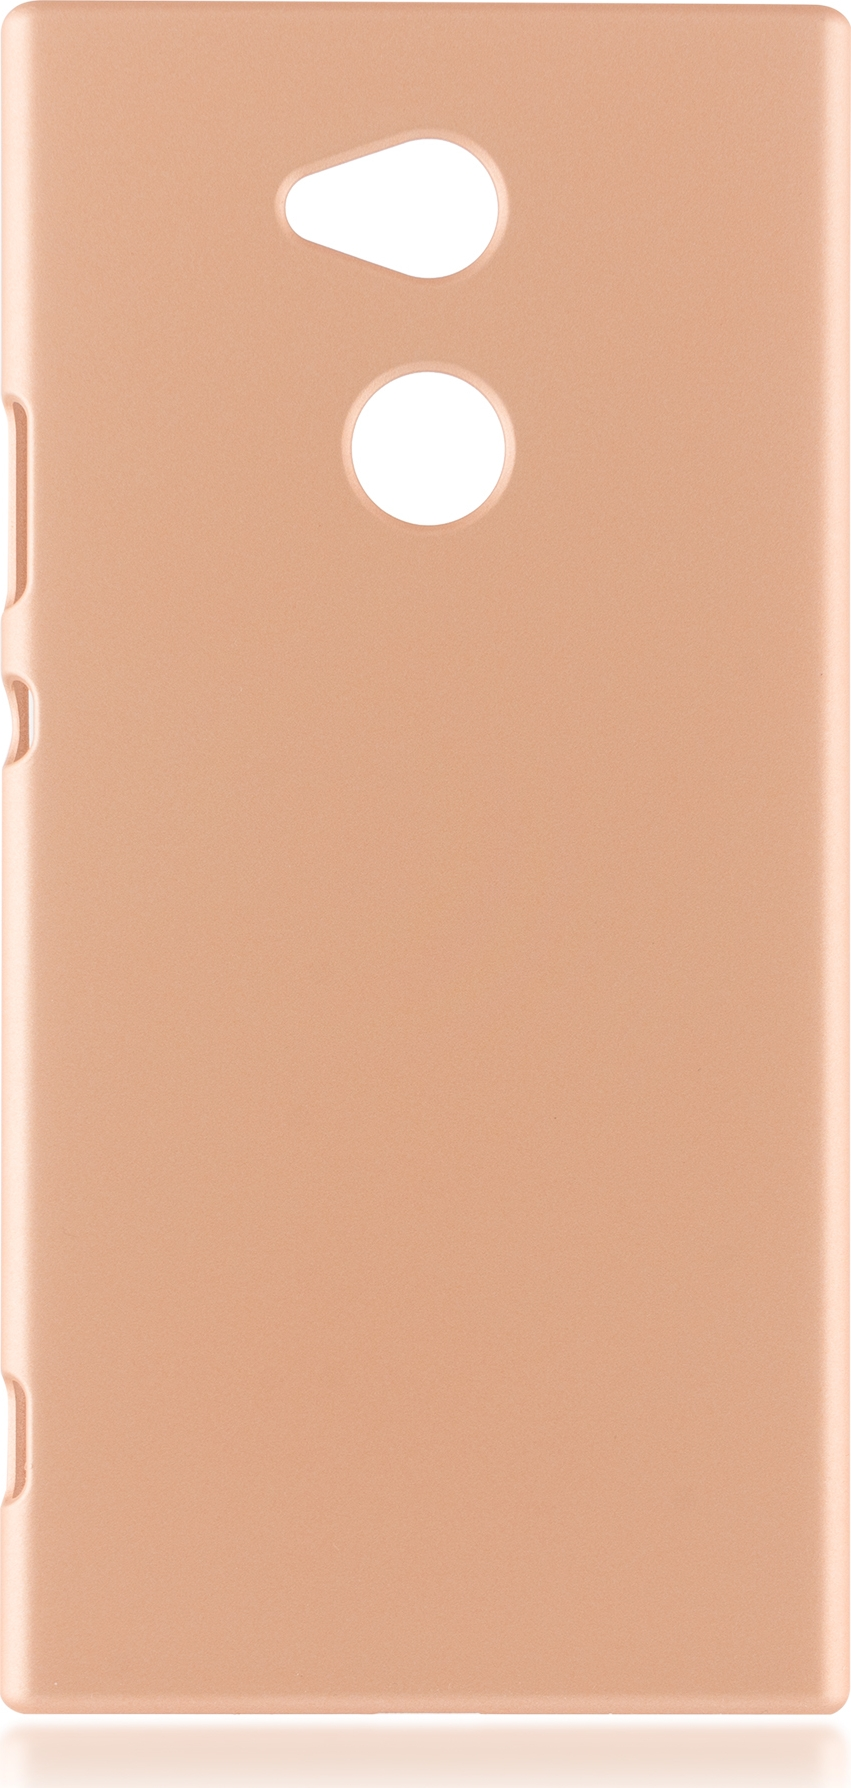 Чехол Brosco Soft-Touch для Sony Xperia XA2 Ultra, золотой чехол для сотового телефона brosco для sony xa2 ultra xa2u book gold золотой